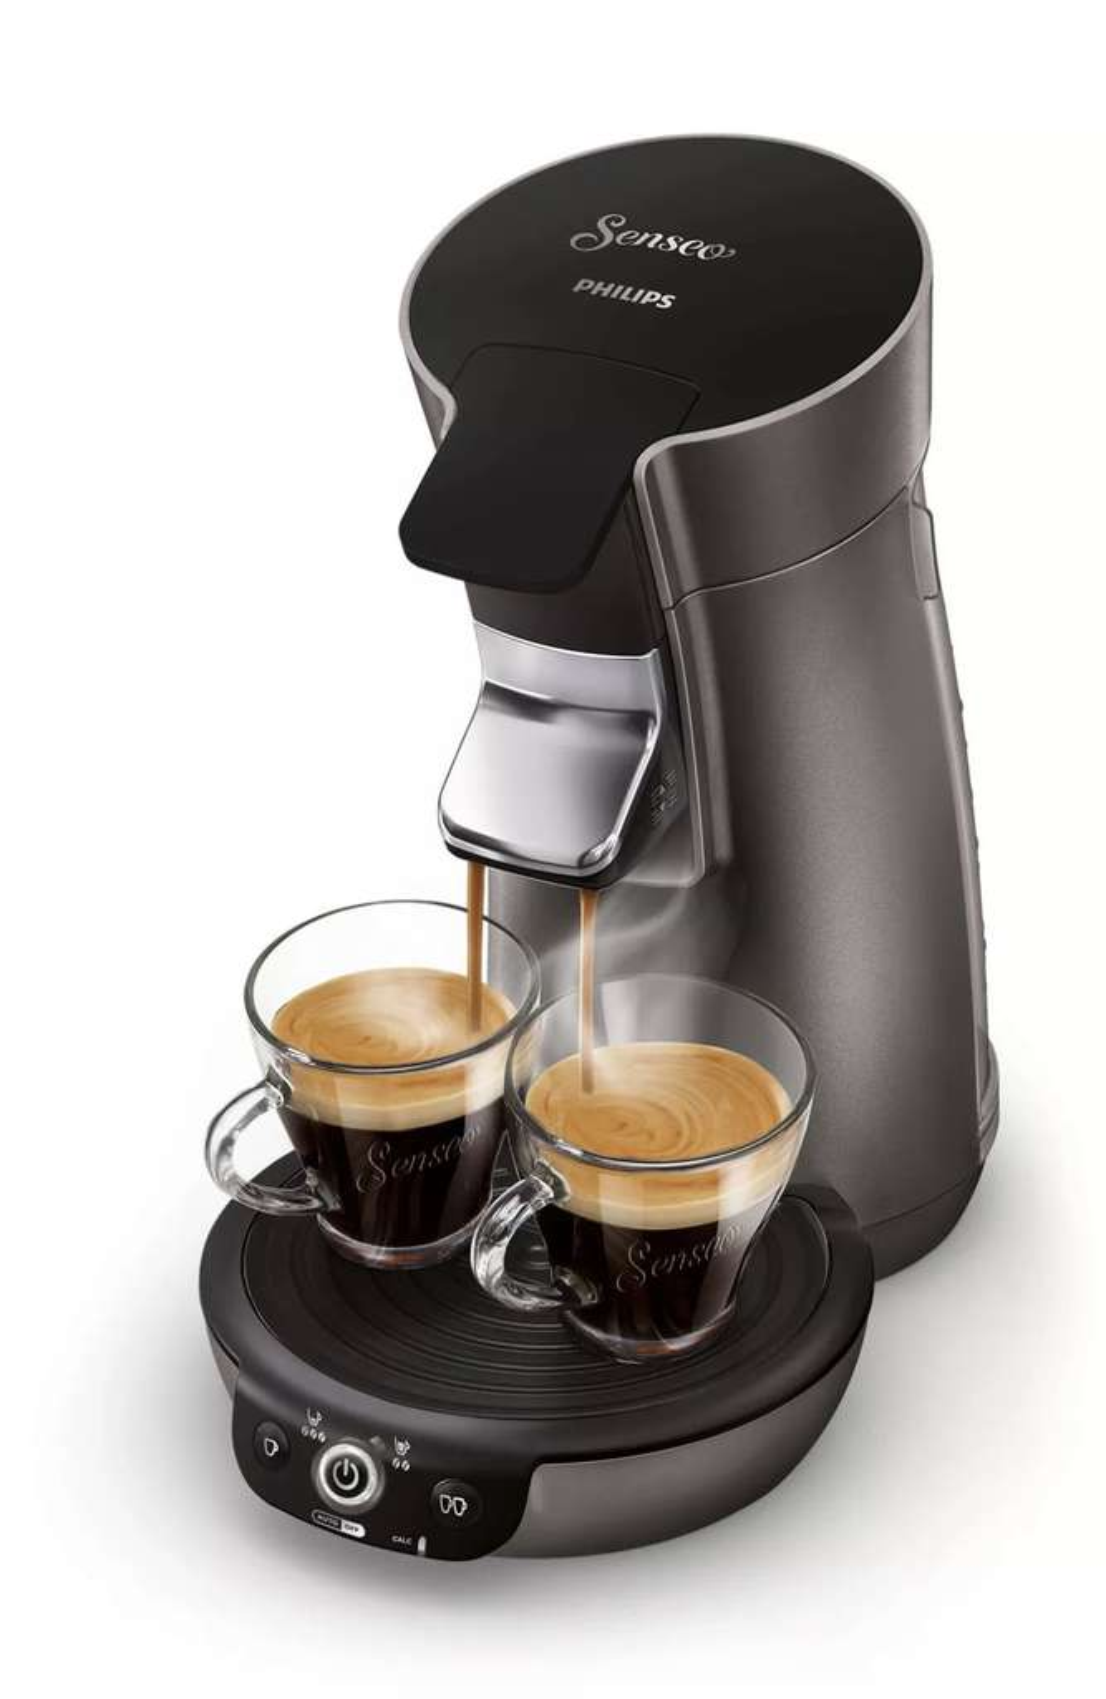 machine caf philips senseo viva caf style hd7833 51. Black Bedroom Furniture Sets. Home Design Ideas